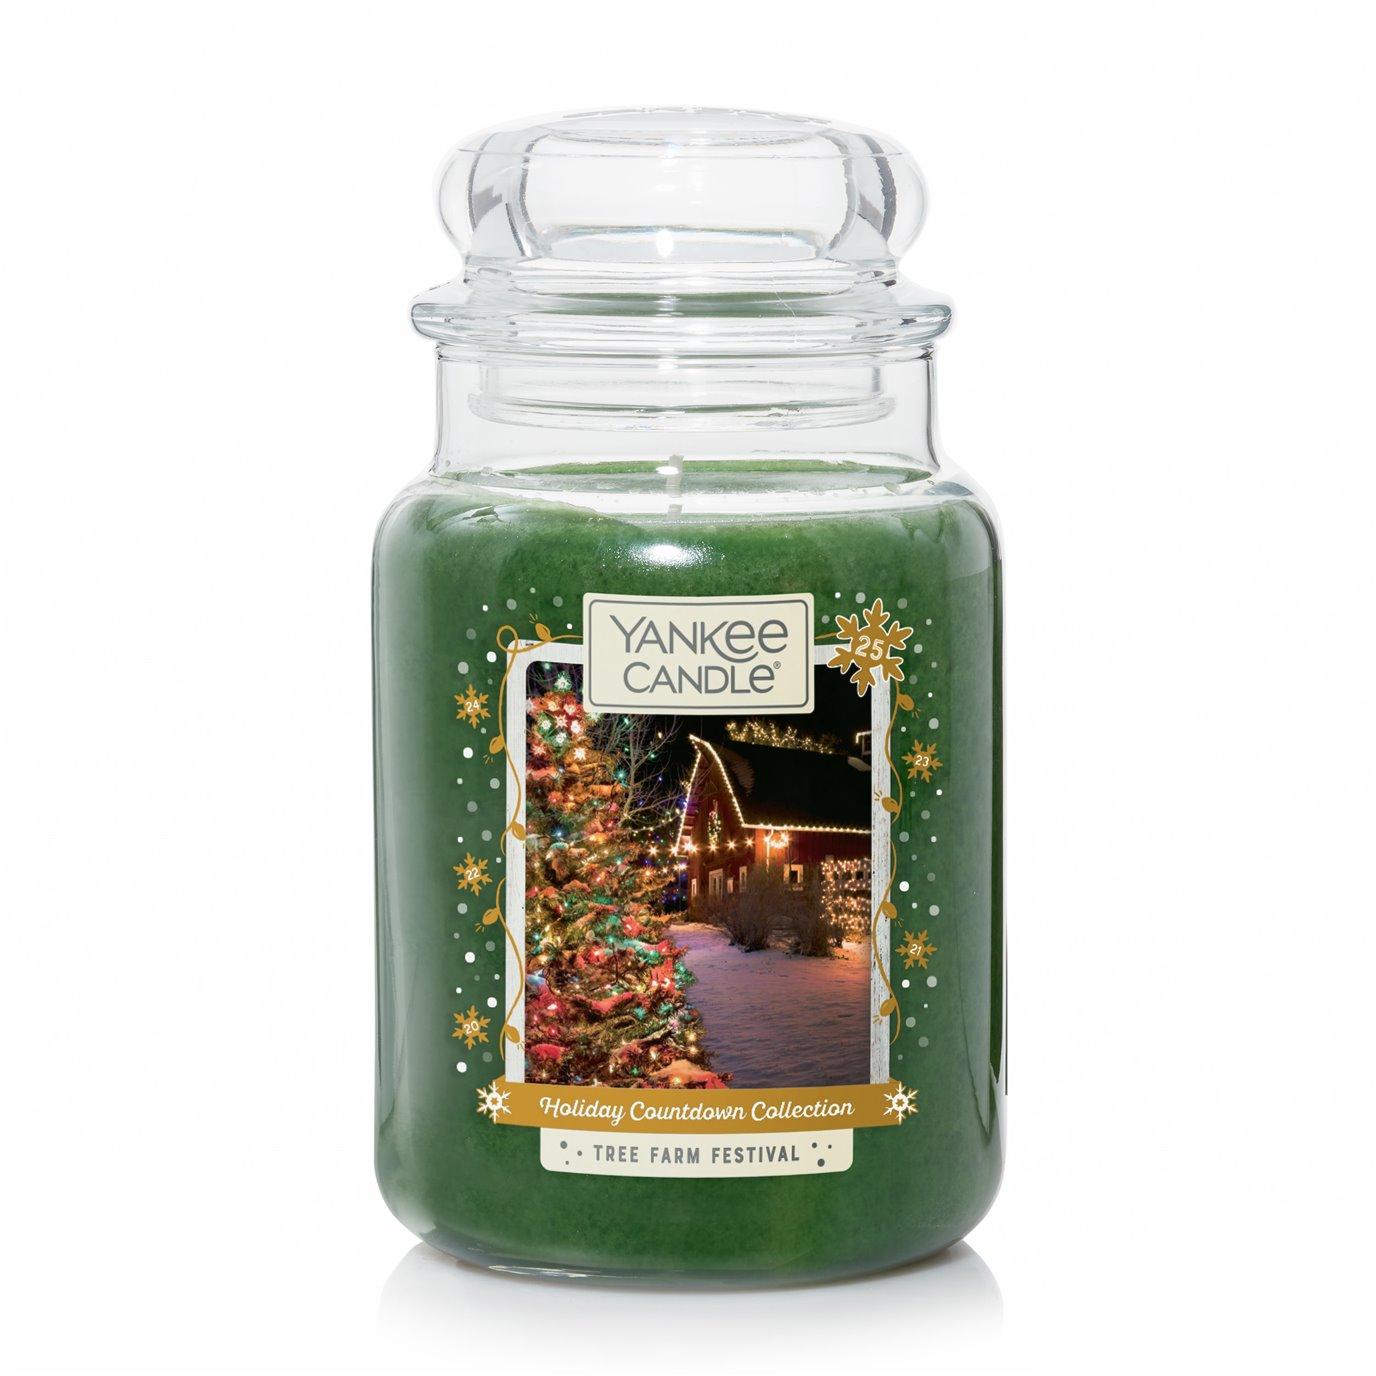 Yankee Candle Tree Farm Festival Large Jar Candle